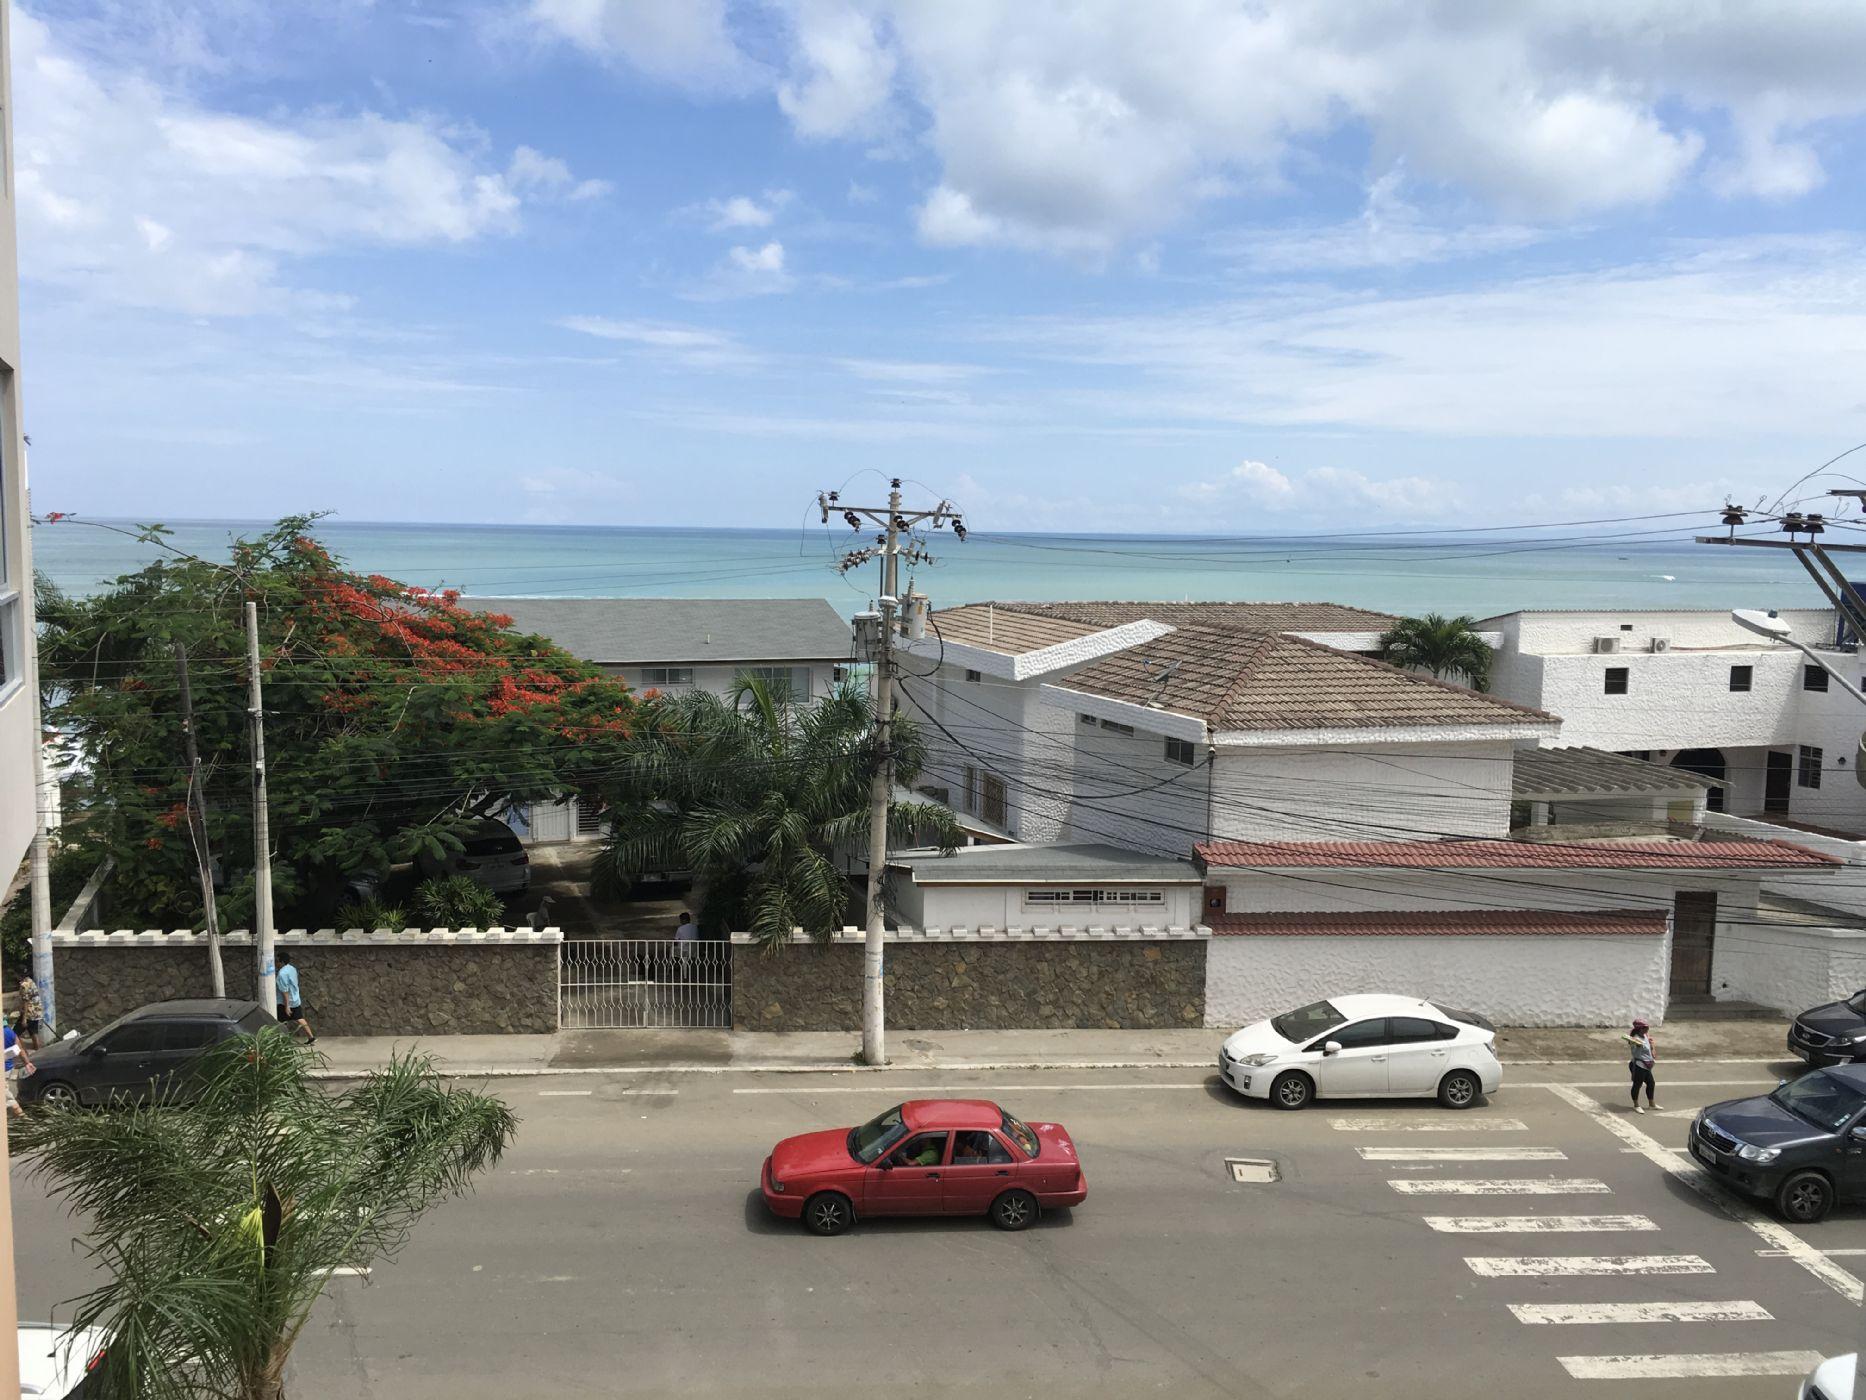 Salinas-Ecuador-property-496326-8.JPG